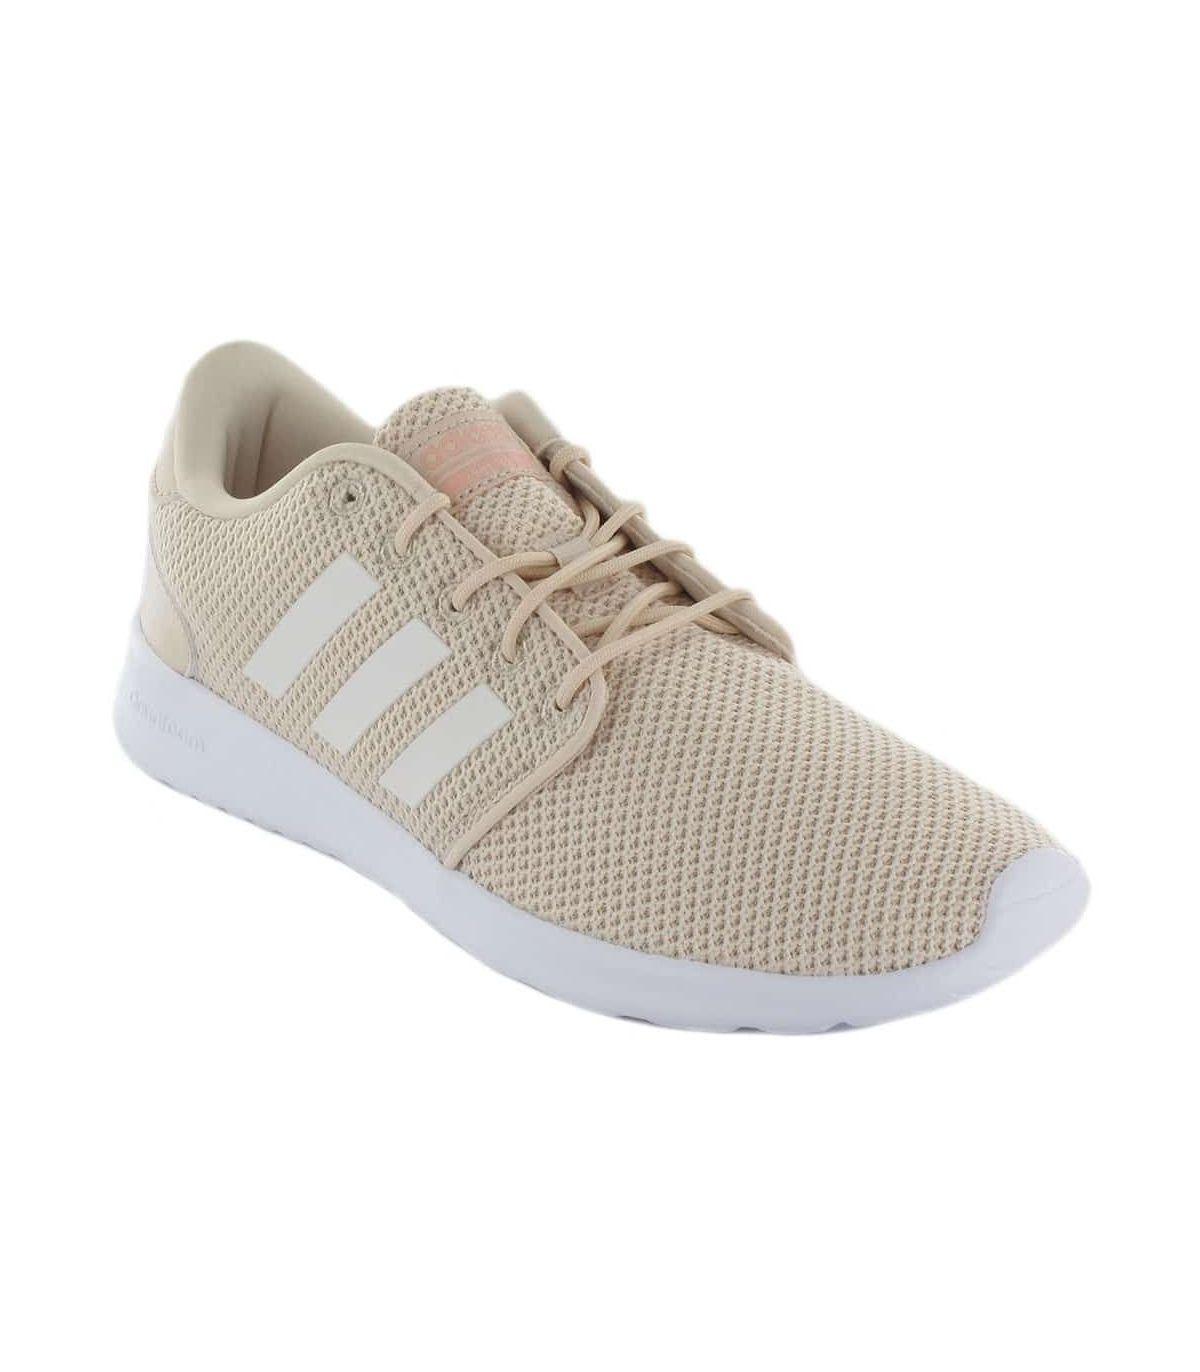 Adidas QT Racer Adidas Calzado Casual Mujer Lifestyle Tallas: 39 1/3, 40, 40 2/3, 41 1/3, 42, 42 2/3, 44; Color: beige